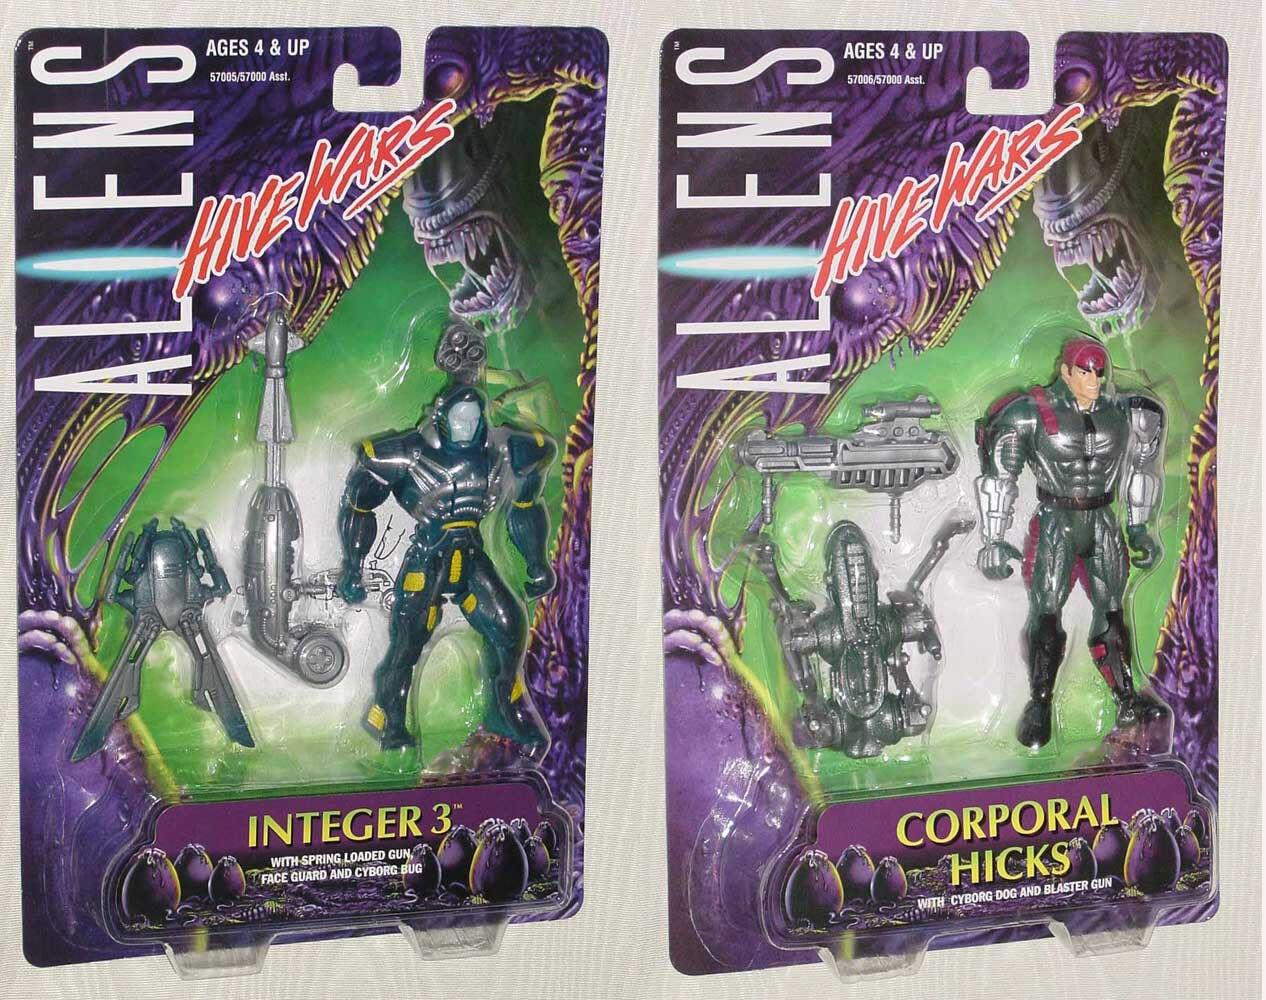 Aliens Colmena guerras entero 3 Resorte pistola cabo Hicks Cyborg perro